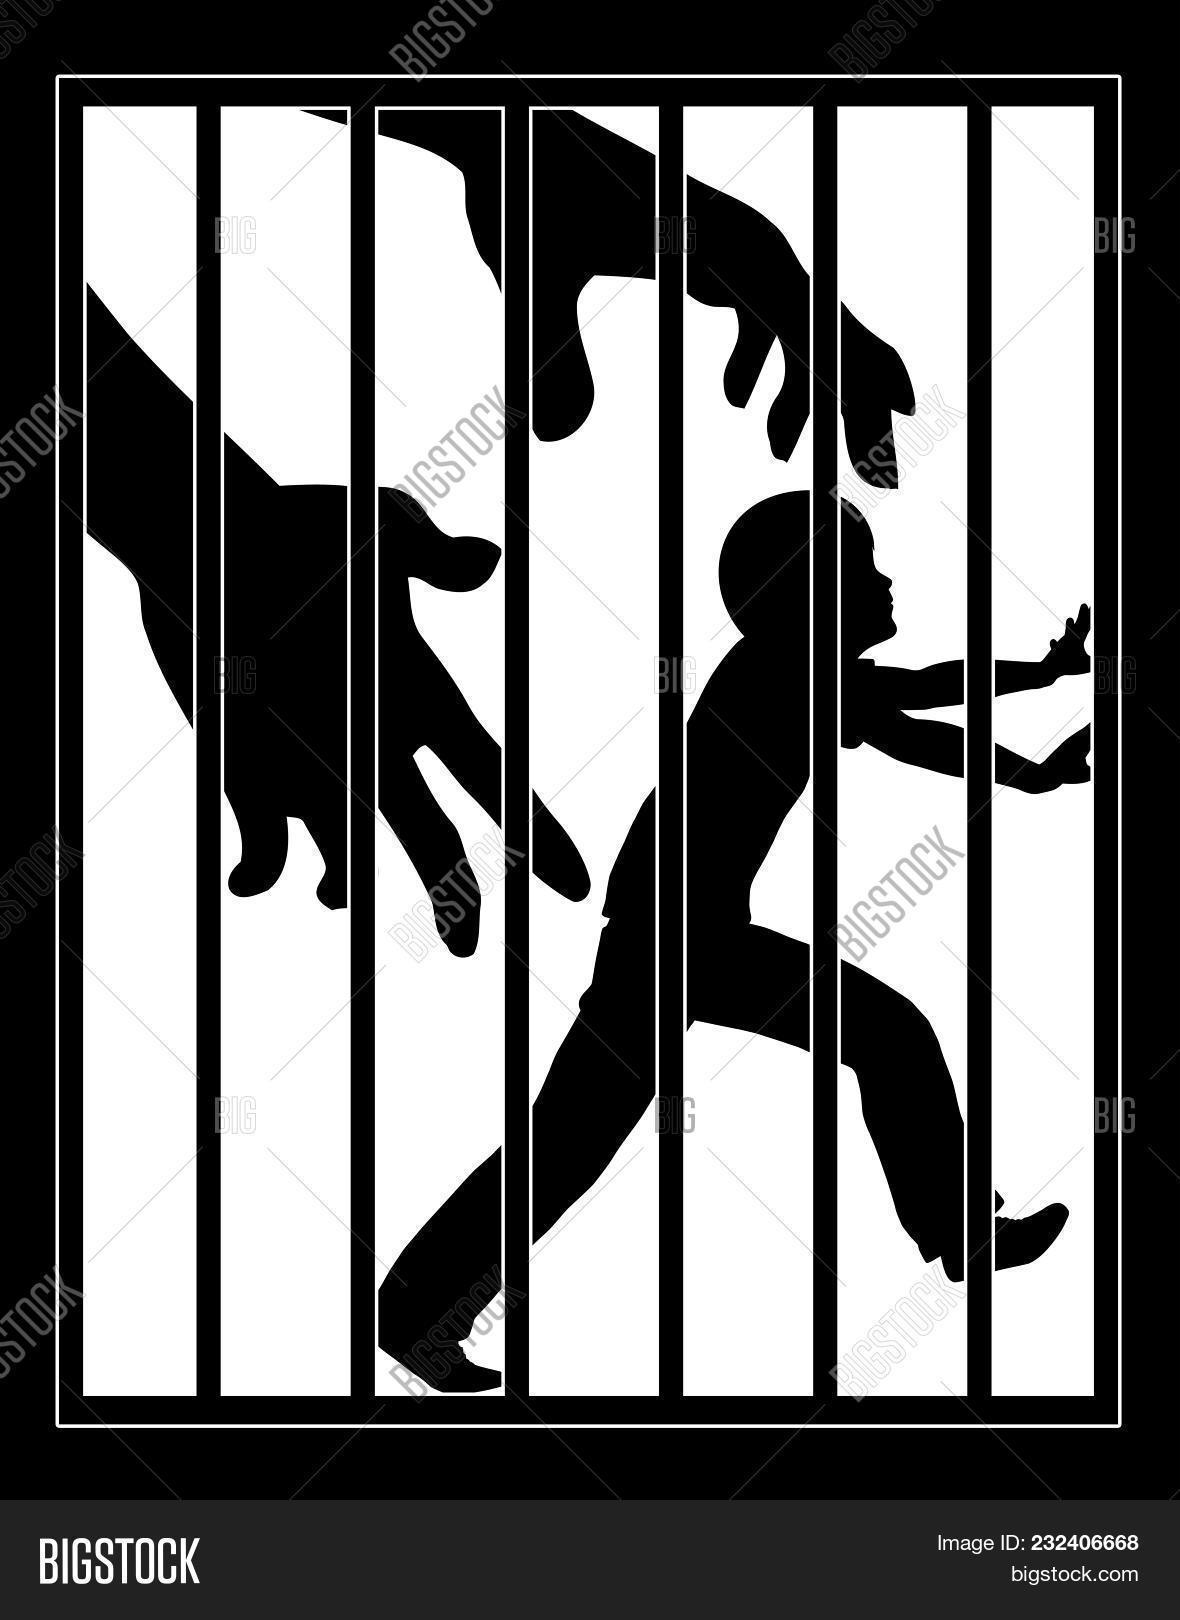 Claustrophobia Image & Photo (Free Trial) | Bigstock